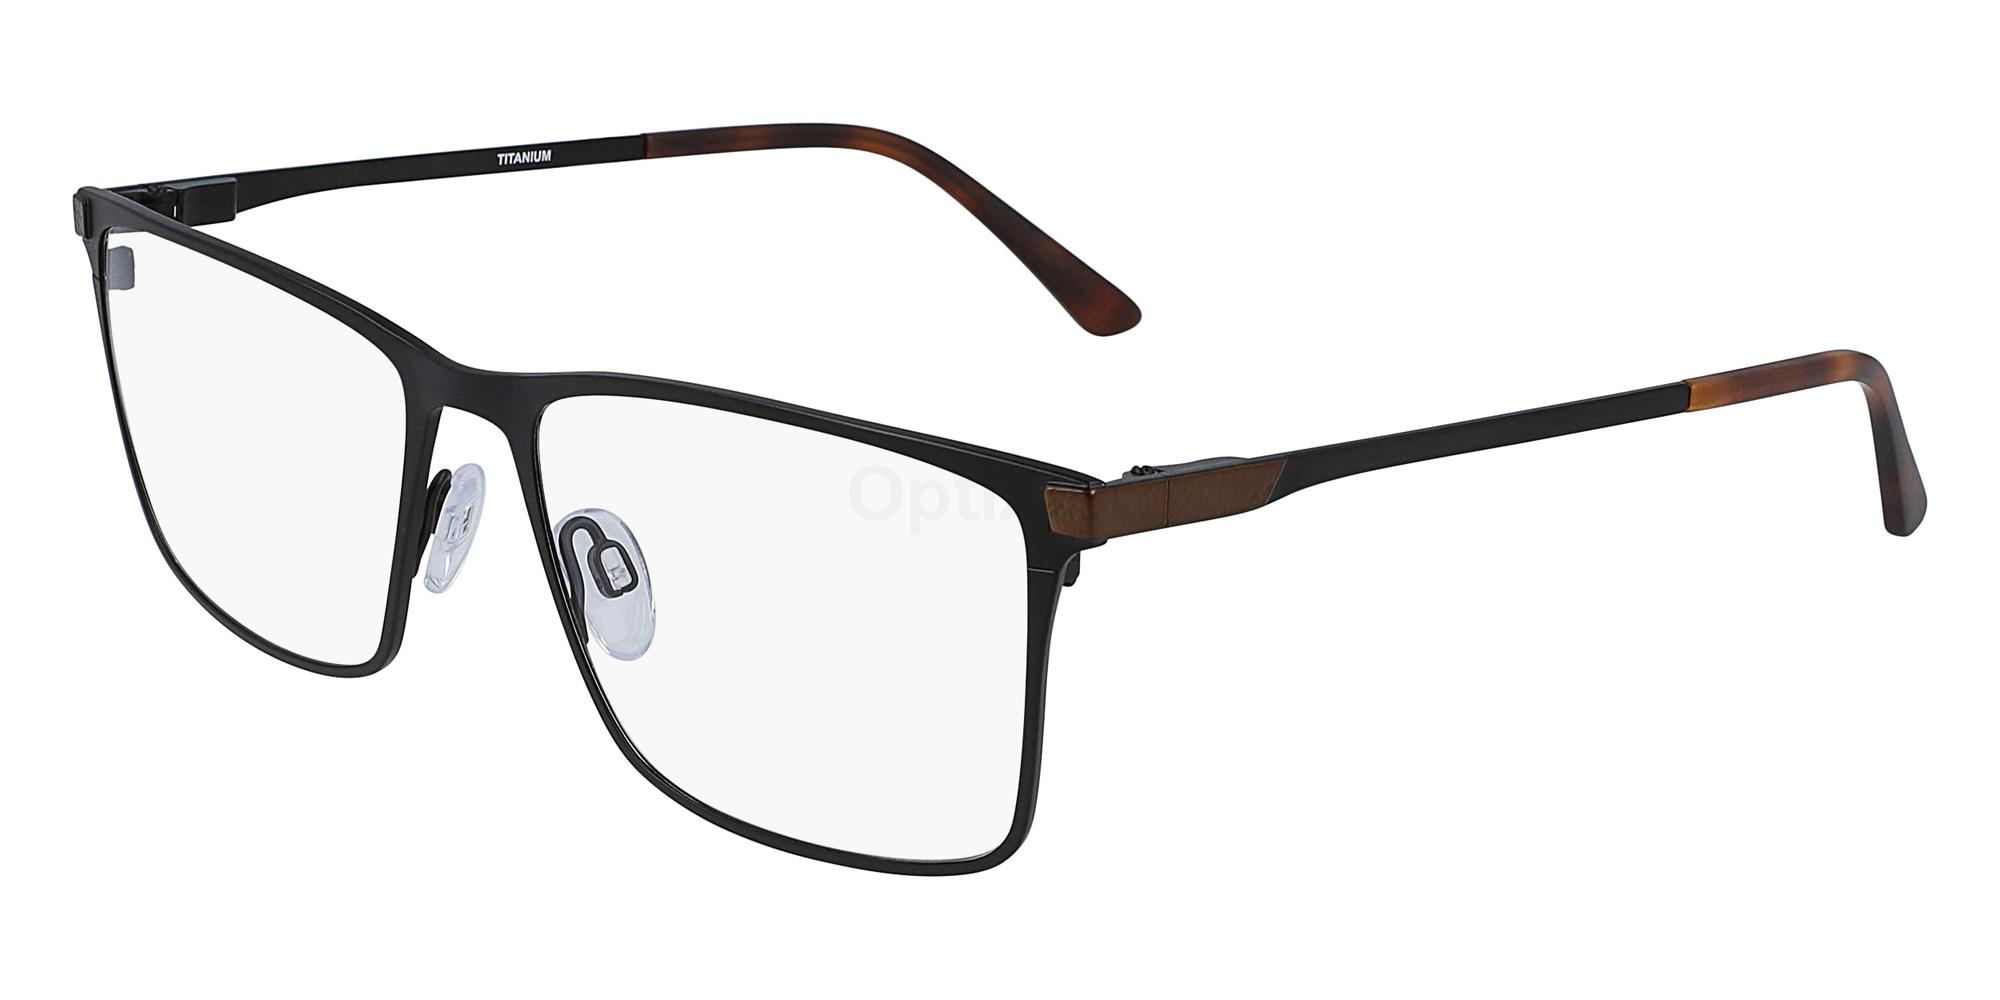 001 SK2833 GEDIGEN Glasses, Skaga